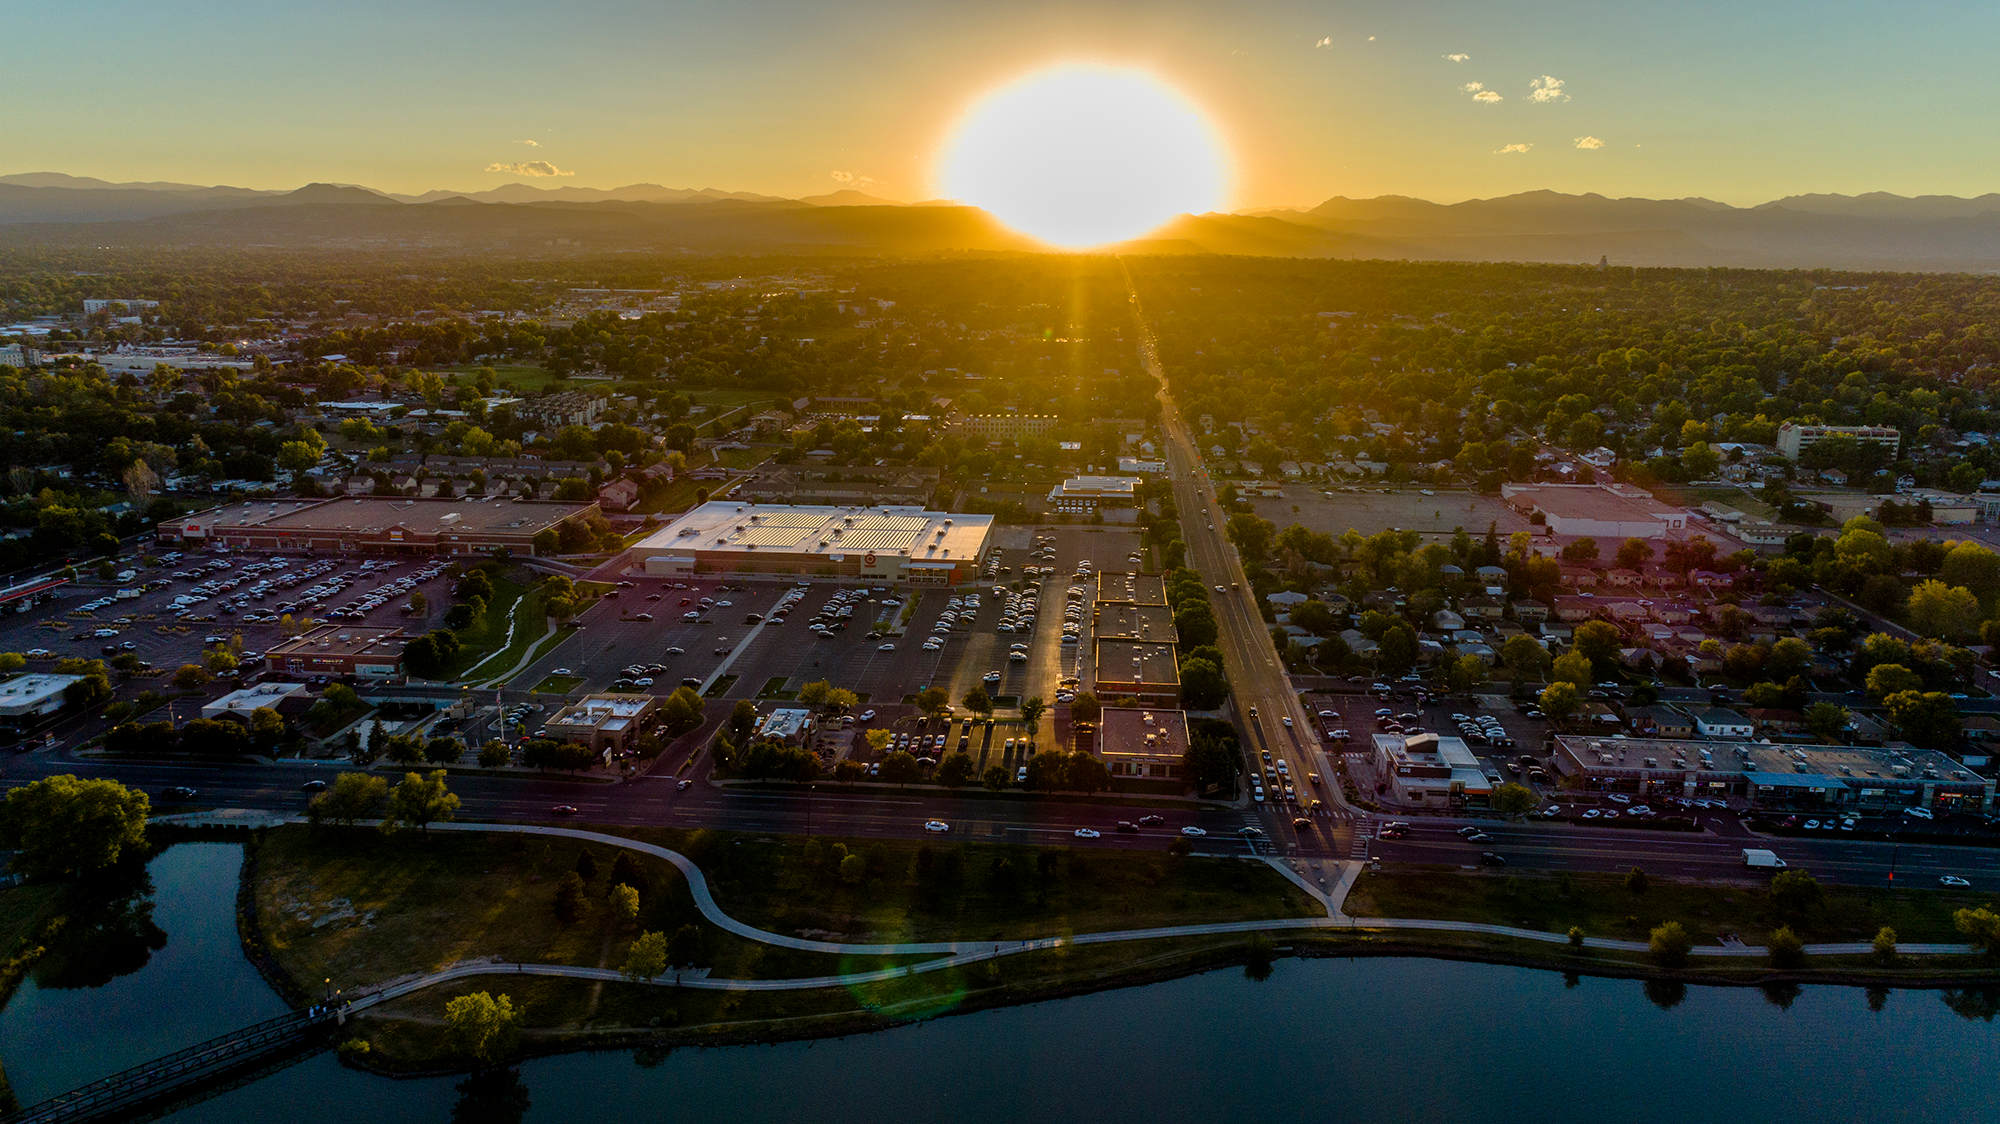 Sun over The Rockies